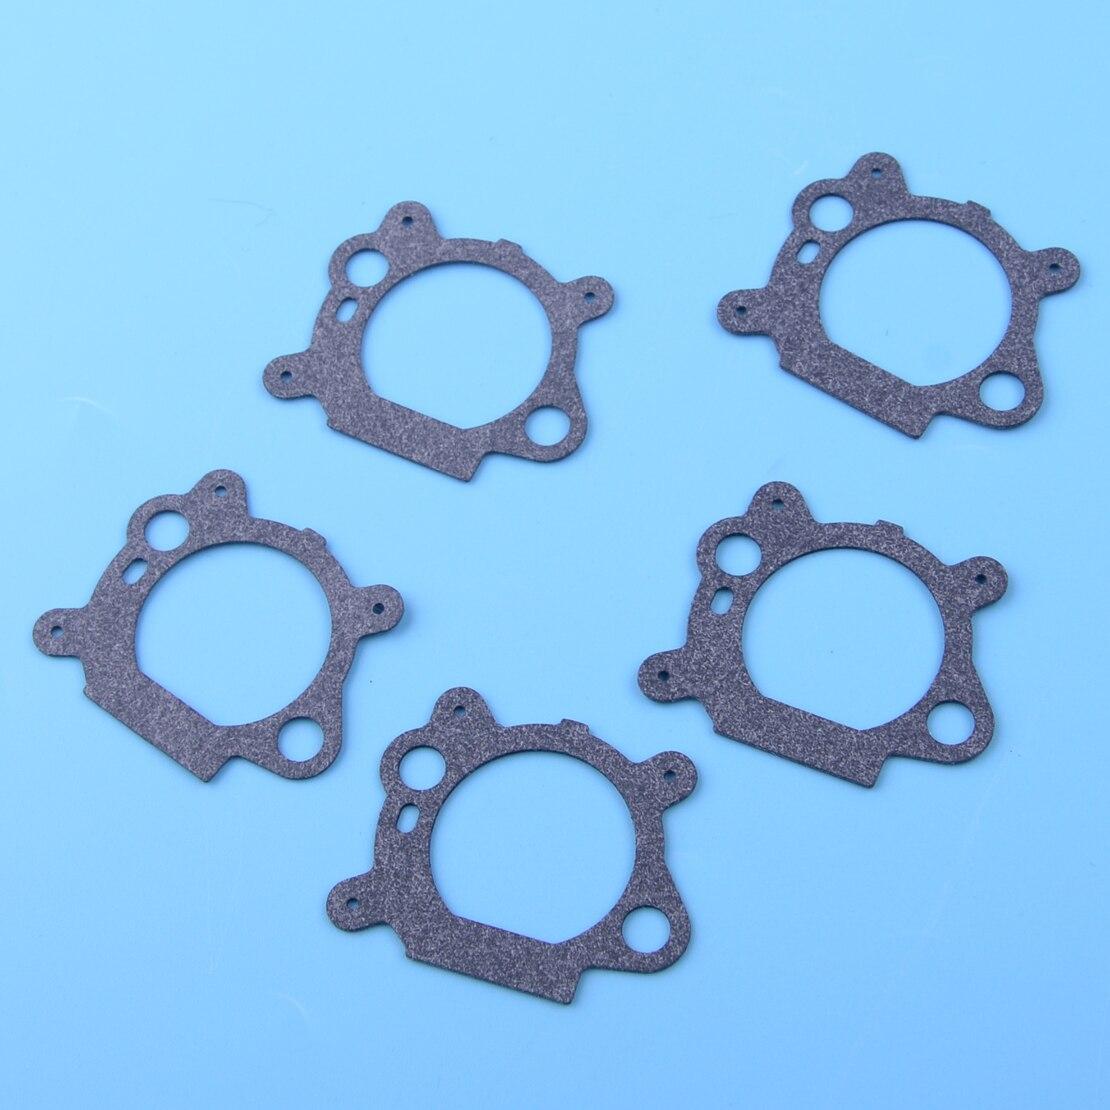 LETAOSK 5pcs Carburetor Gasket Replacement 799868 498254 497347 497314 498170 Fit For Briggs & Stratton